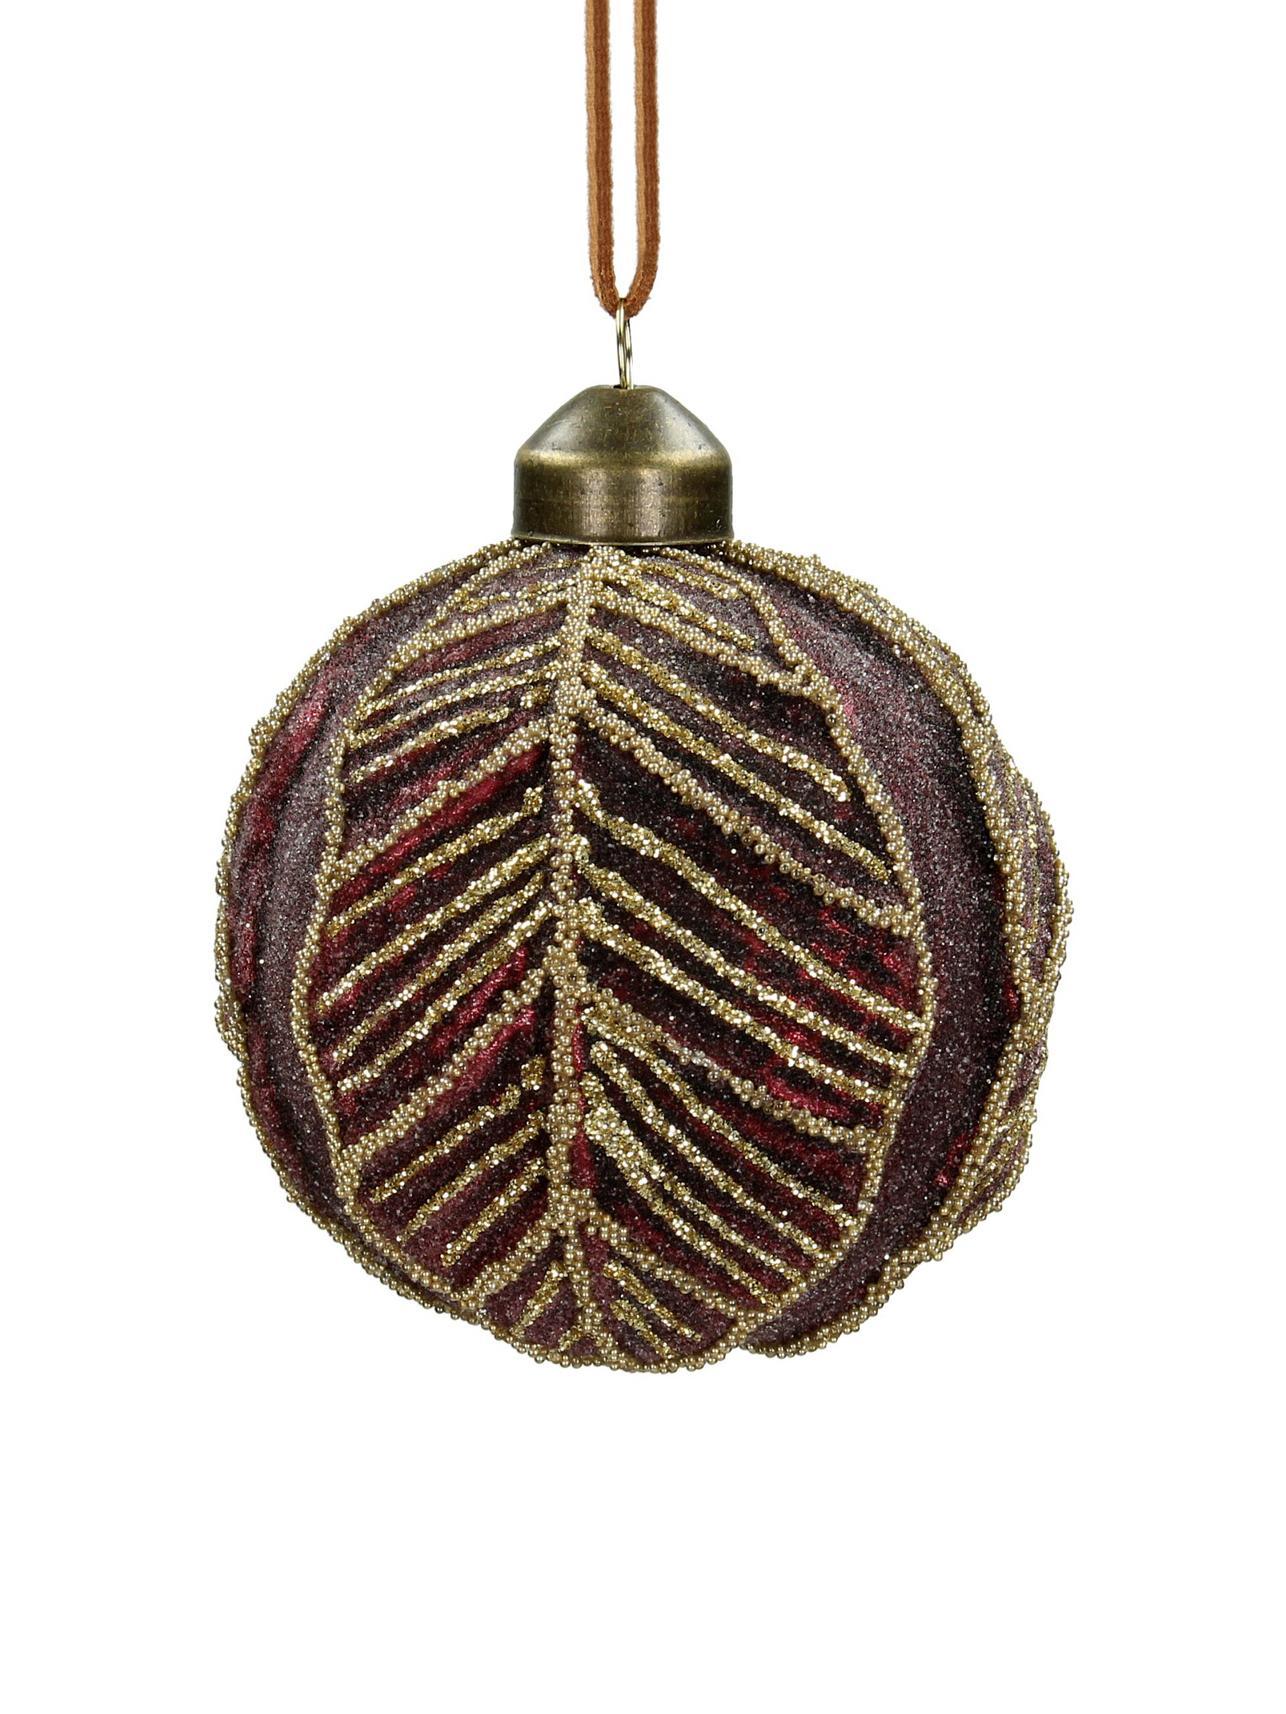 Weihnachtskugeln Leaf Ø8cm, 2Stück, Glas, Polyester, Kunststoff, Dunkelrot, Ø 8 cm